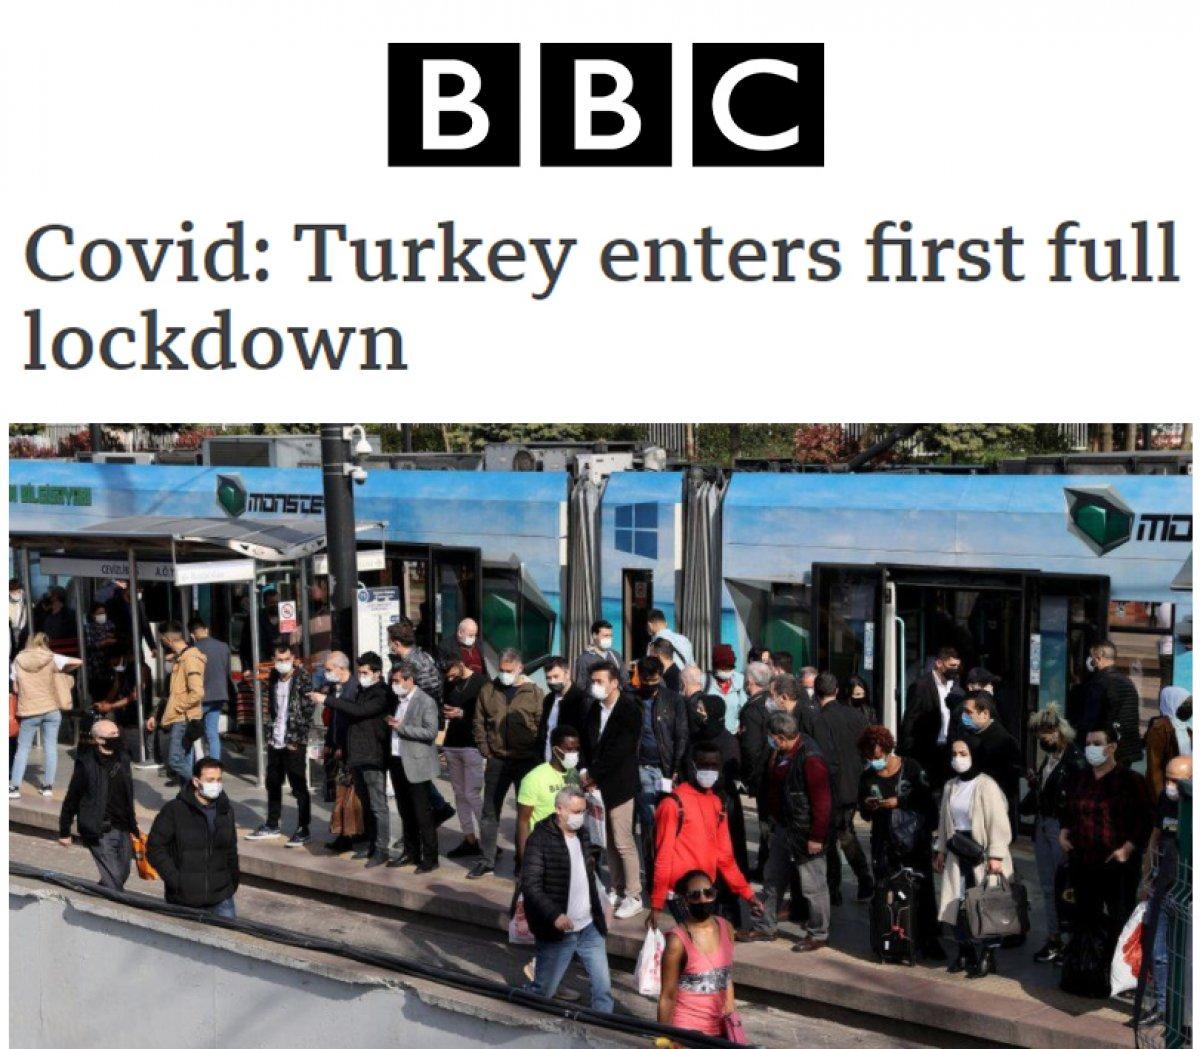 bbc_1725-002.jpg